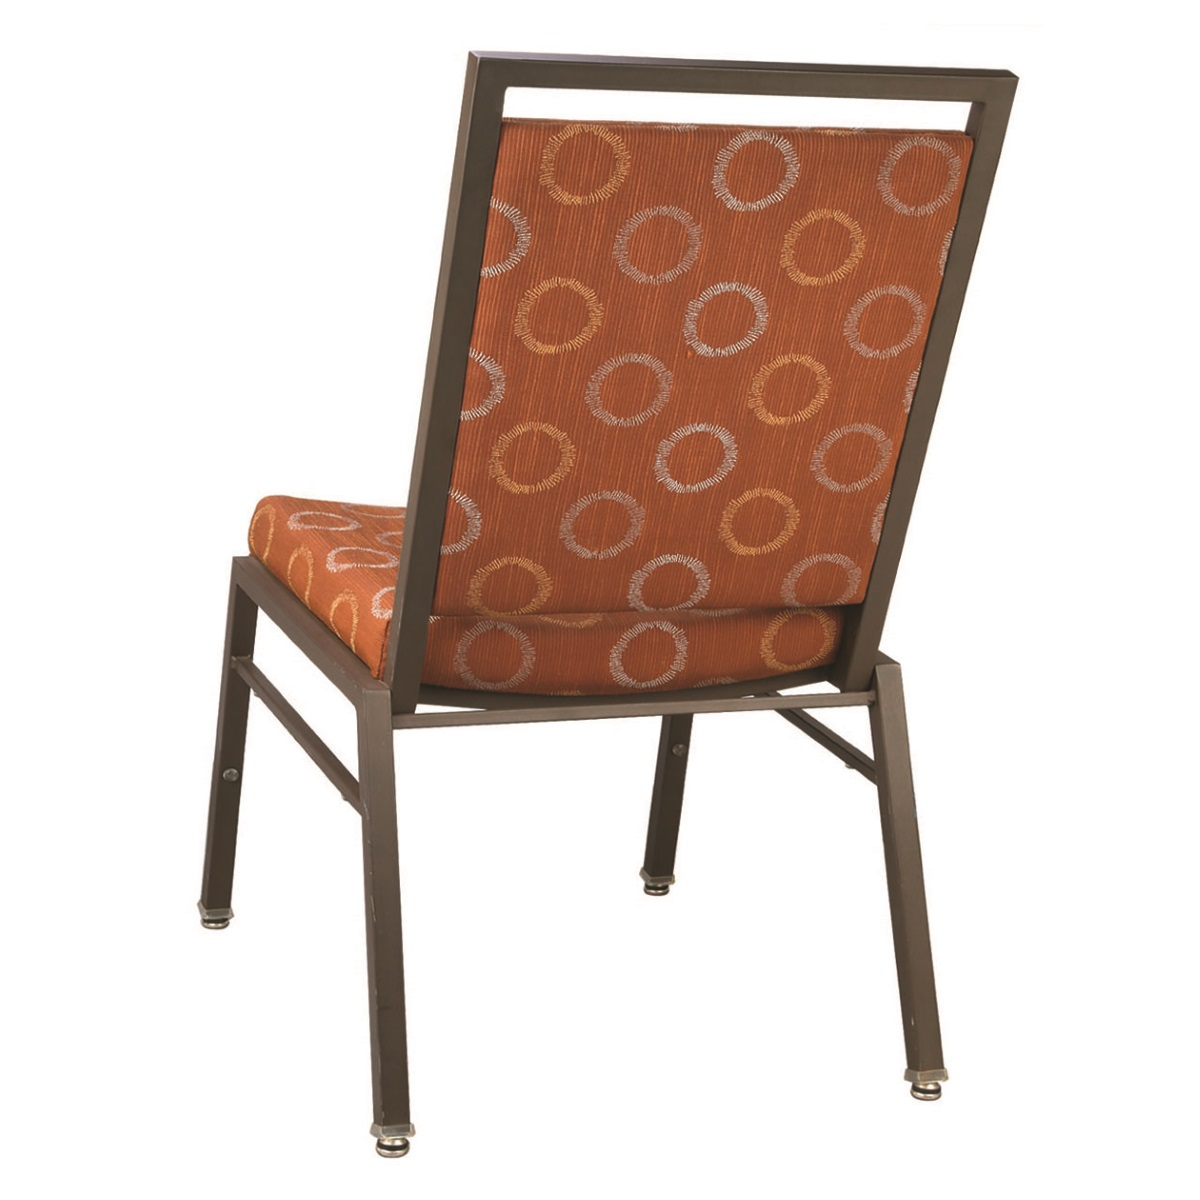 Steel Rectangle Contour Banquet Chair